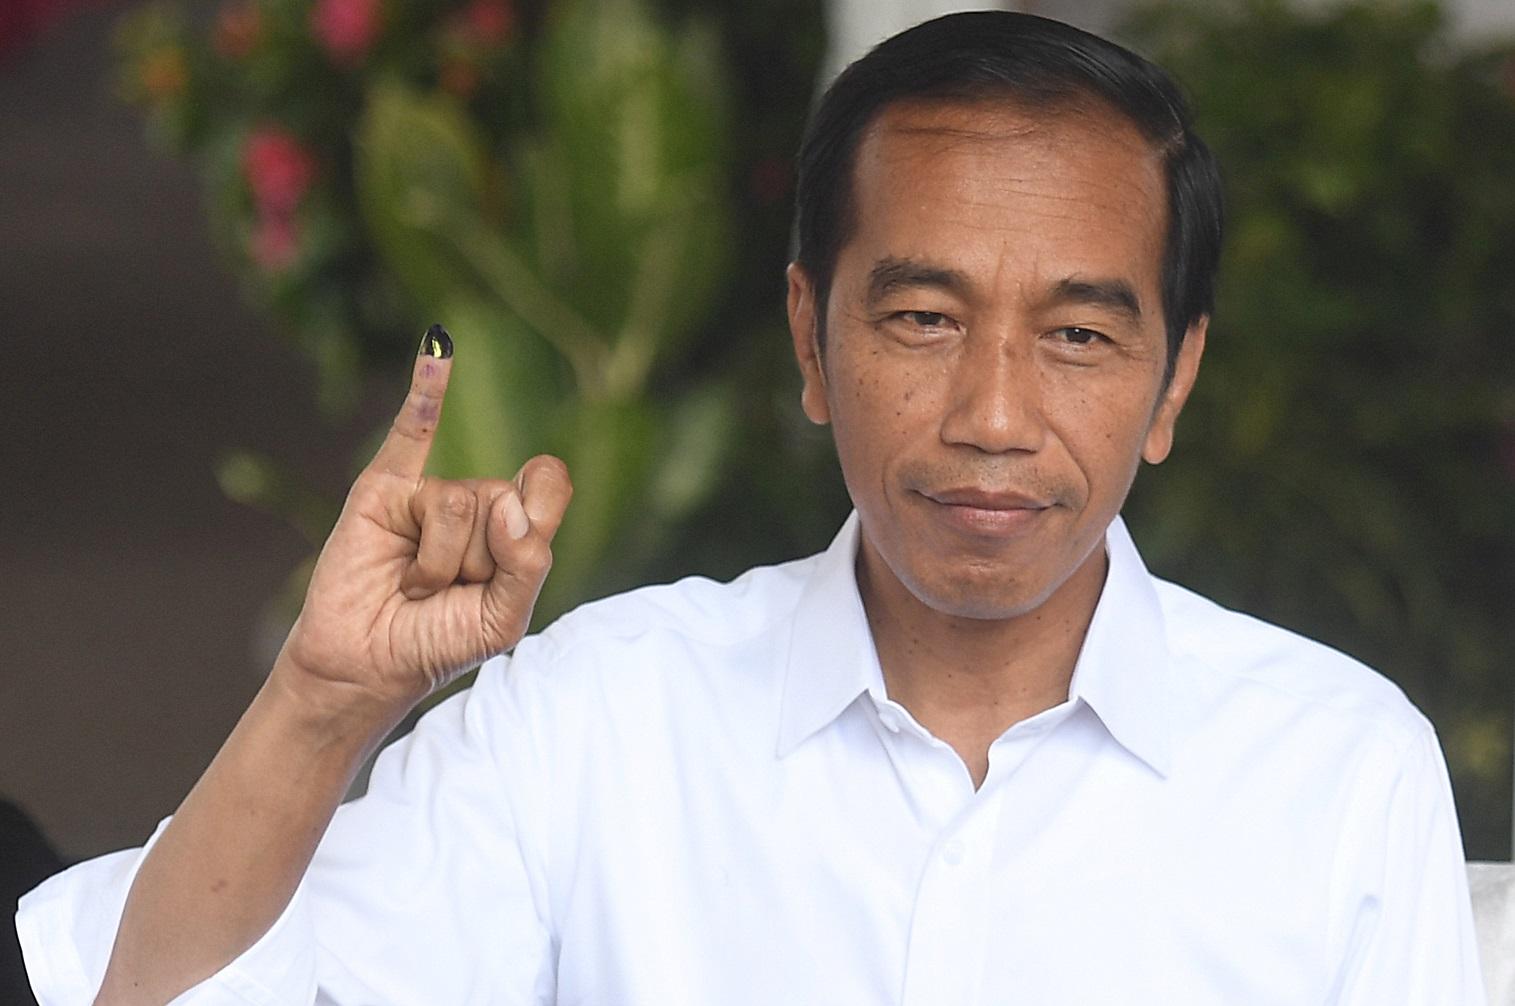 Президент Индонезии Йоко Видодо